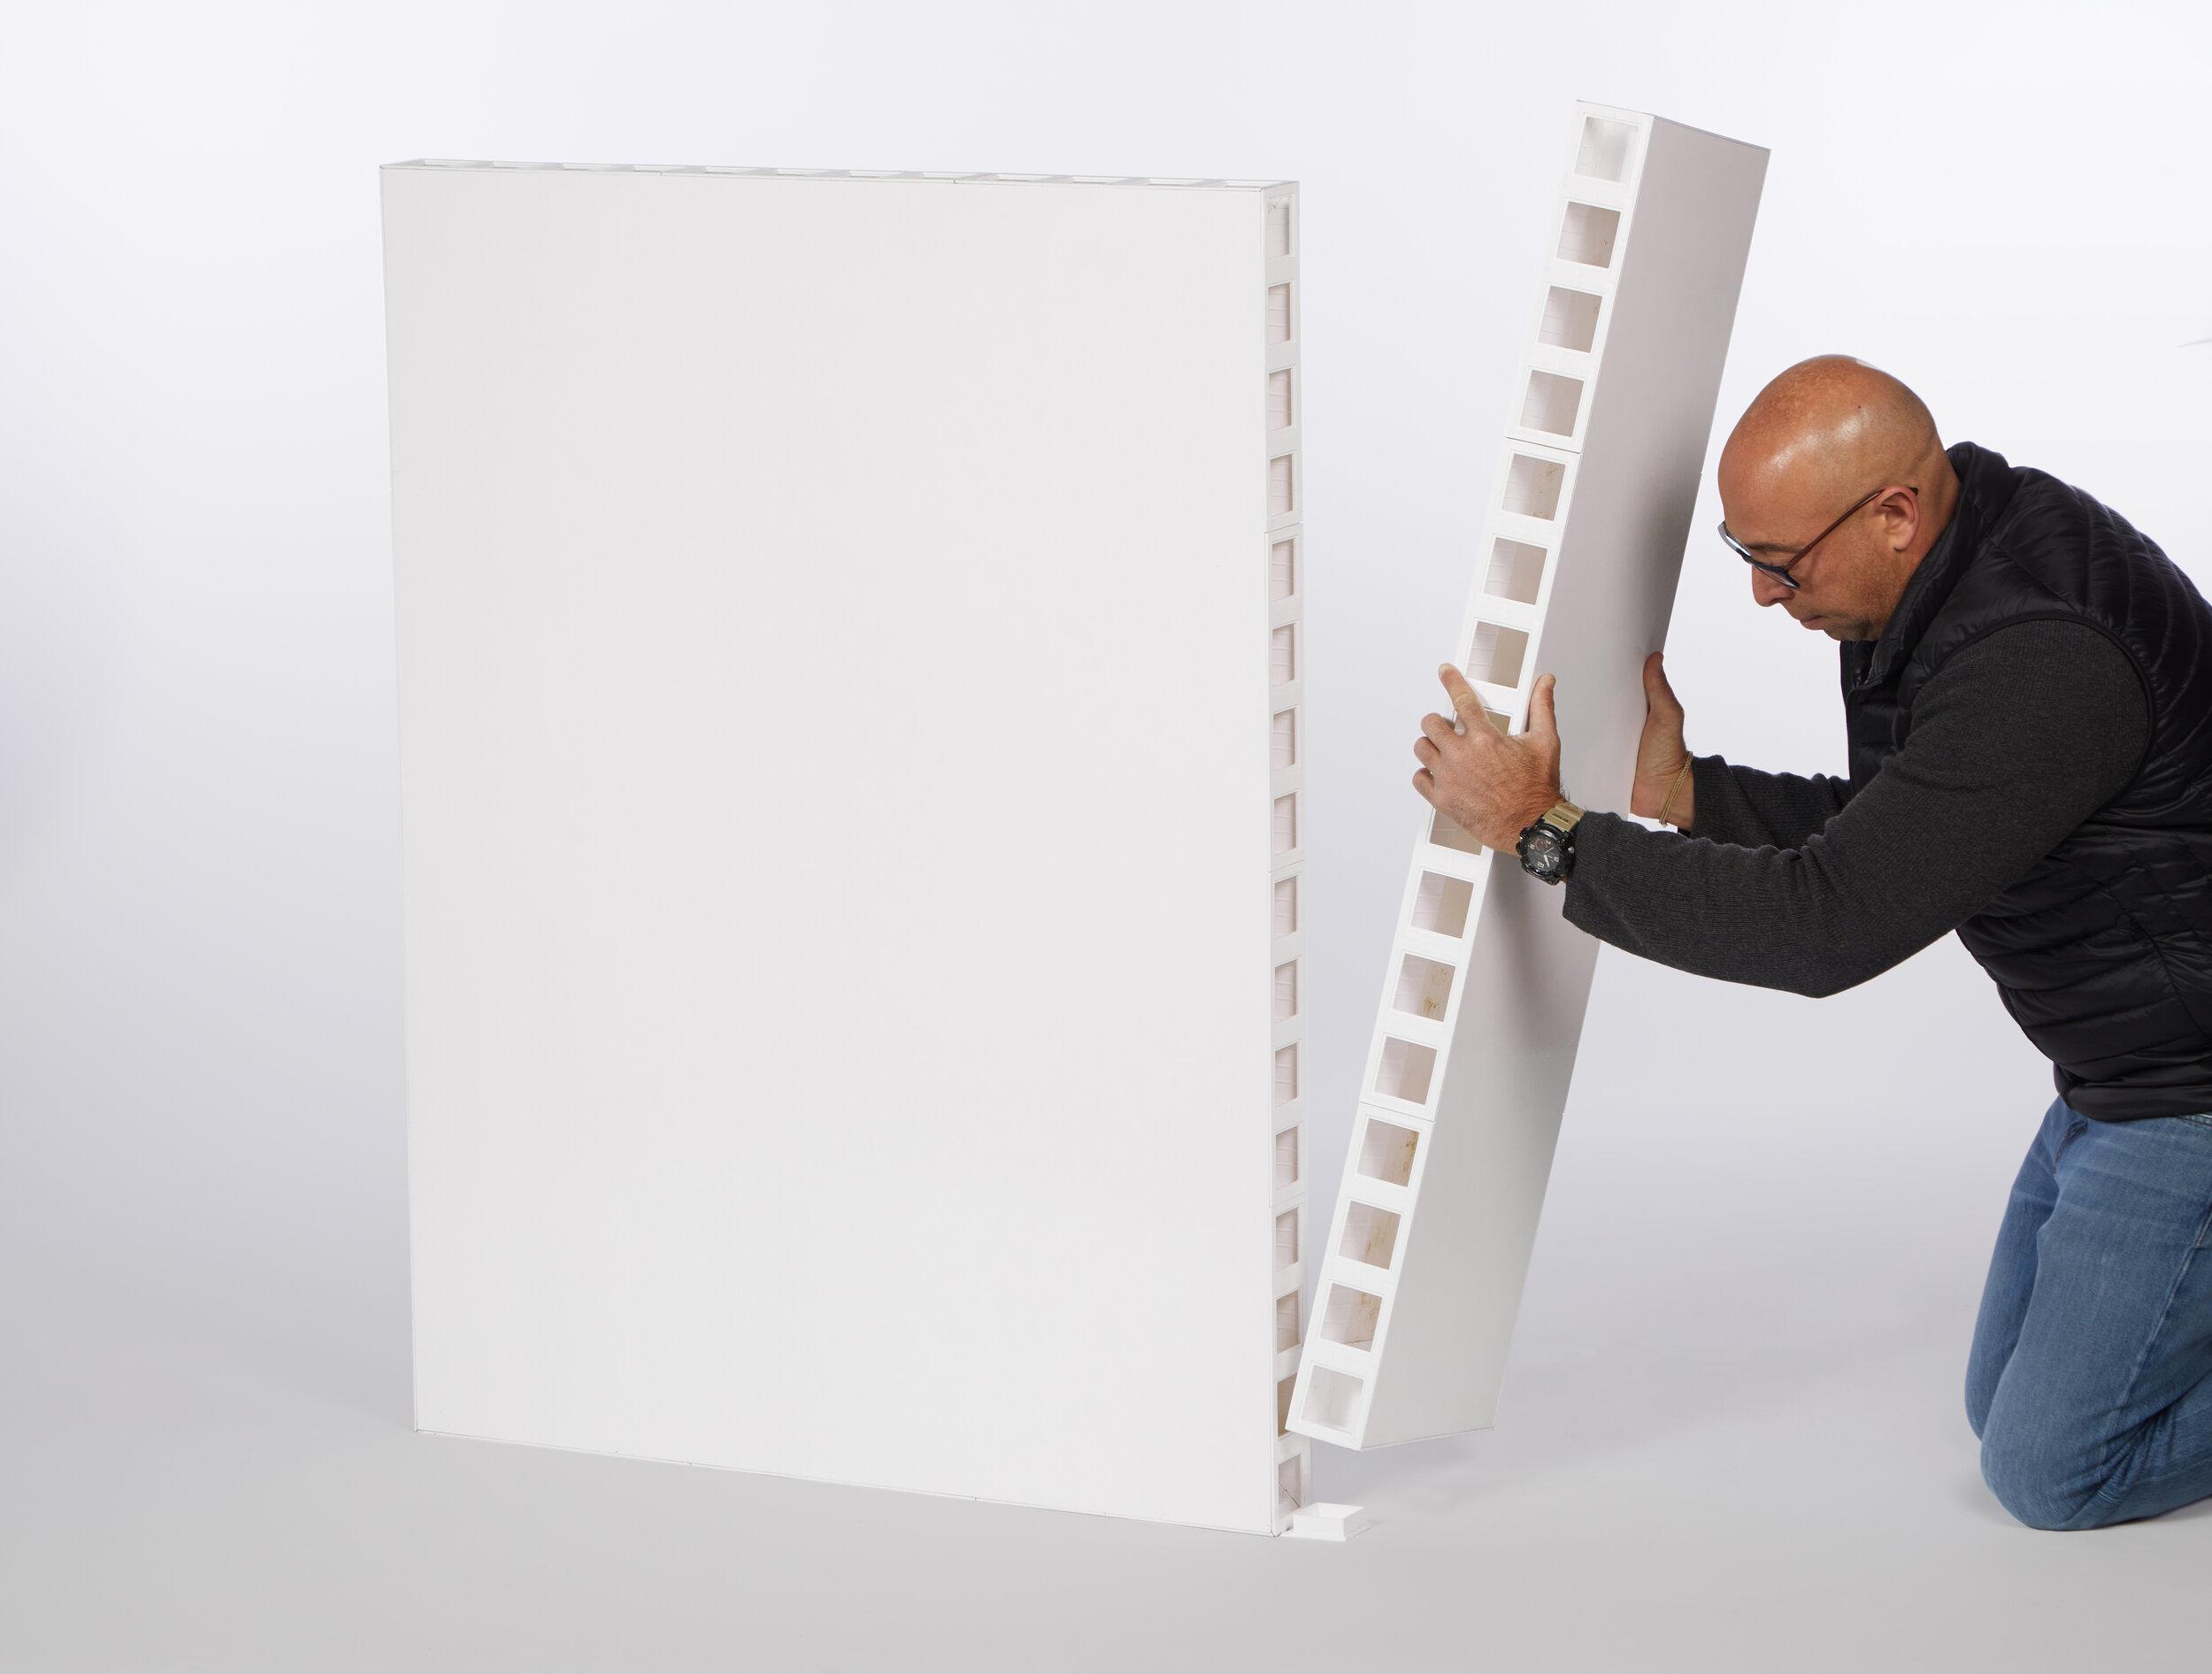 Customizable walls